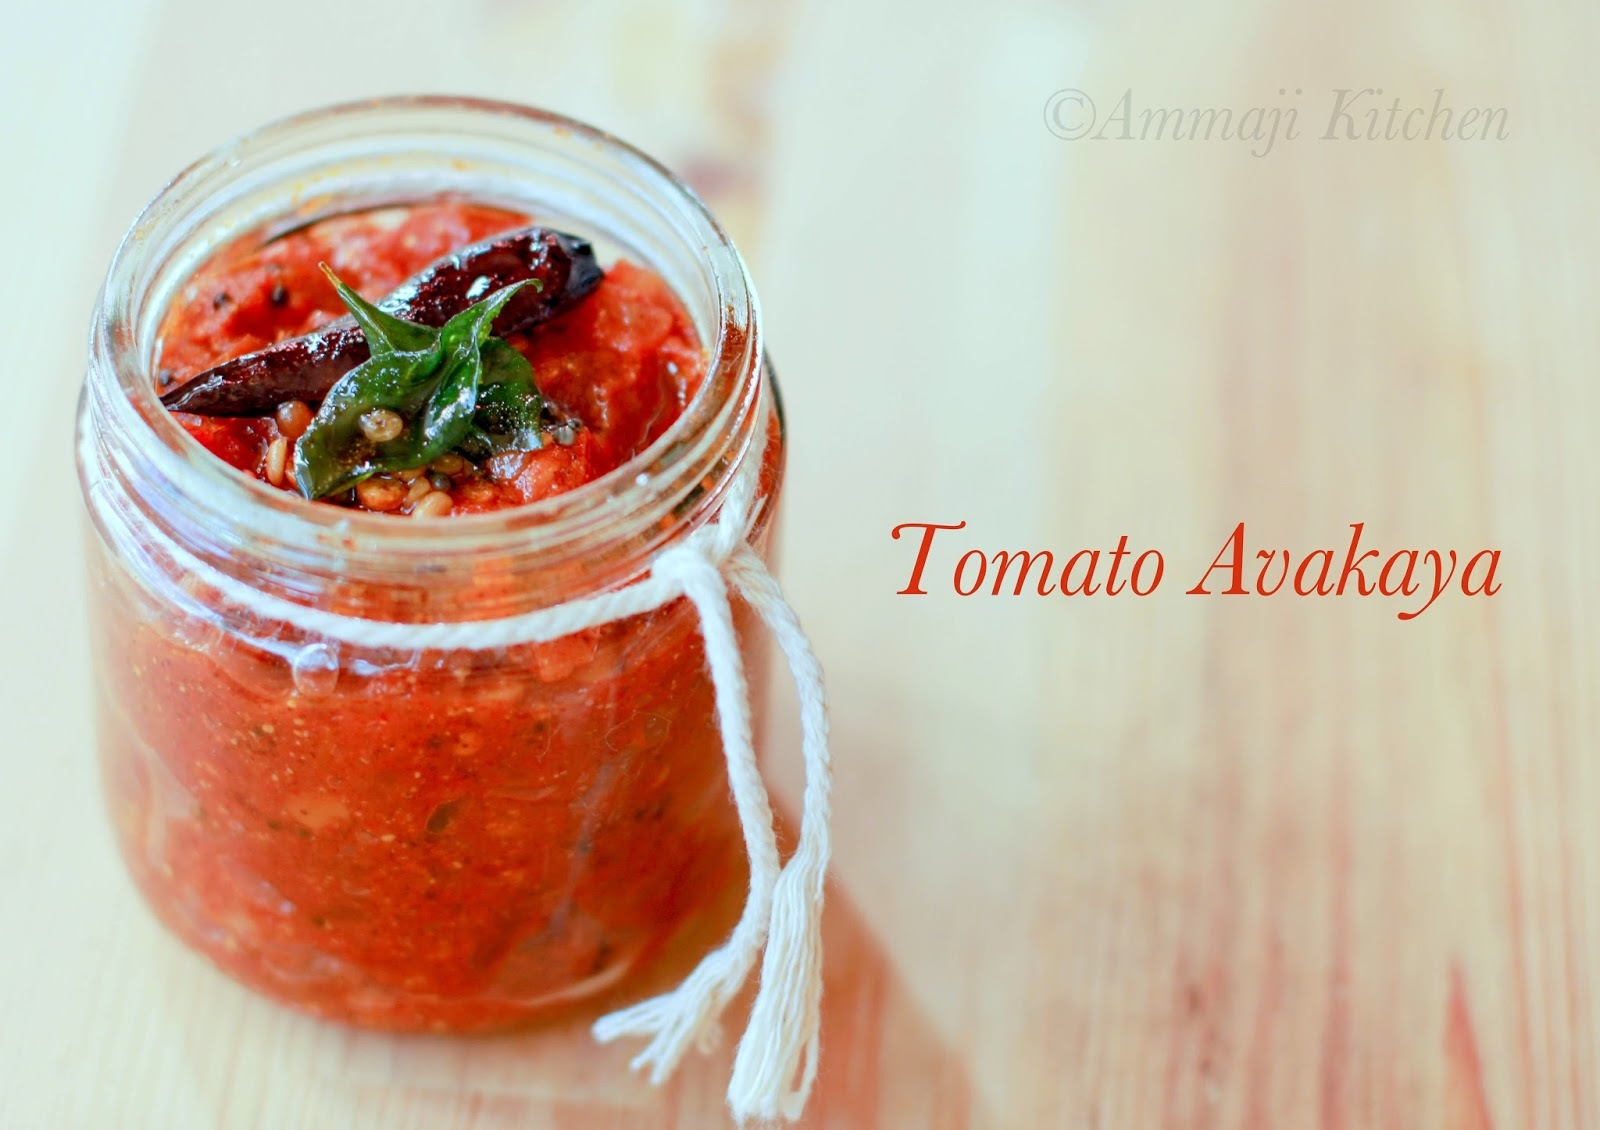 Tomato Pickle | Tomato Avakaya